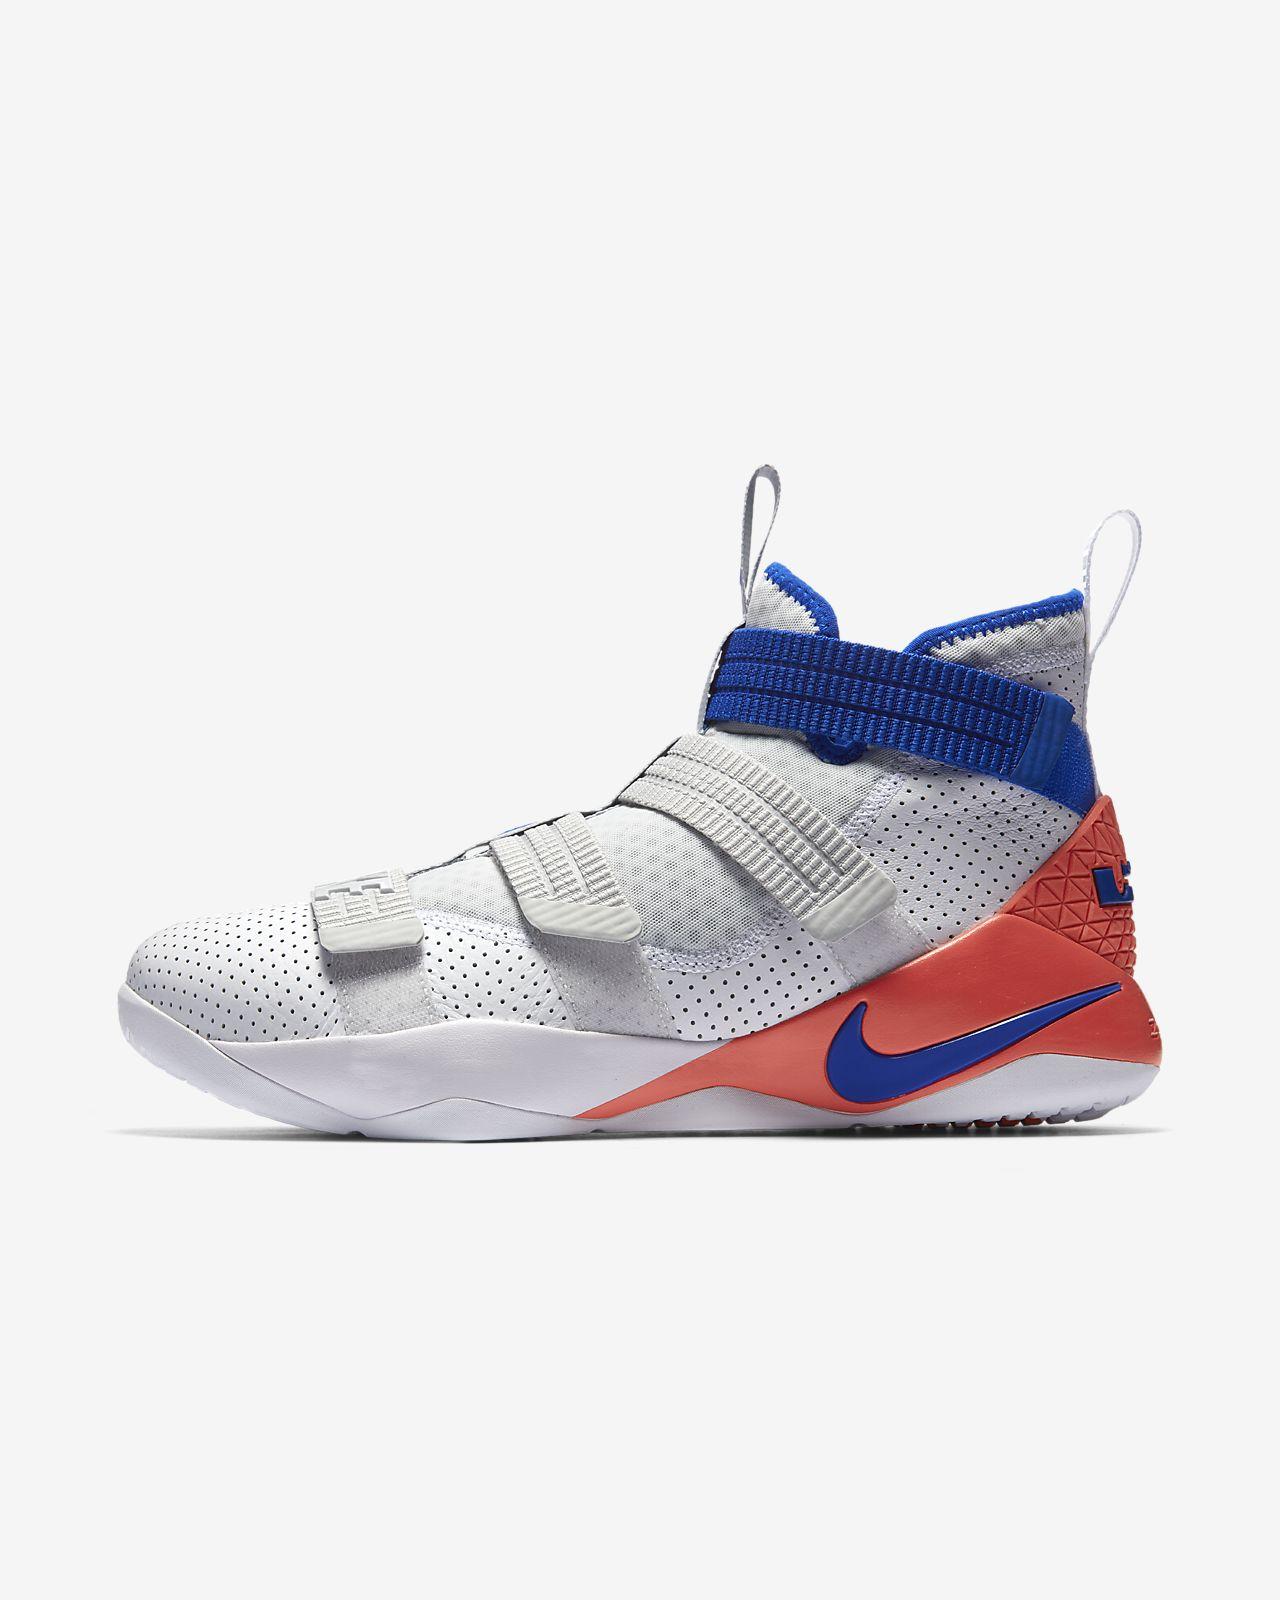 sneakers for cheap 79d7e 44a24 Großes Design Schuhe Nike Lebron The 11 11 Experience - sommerprogramme.de